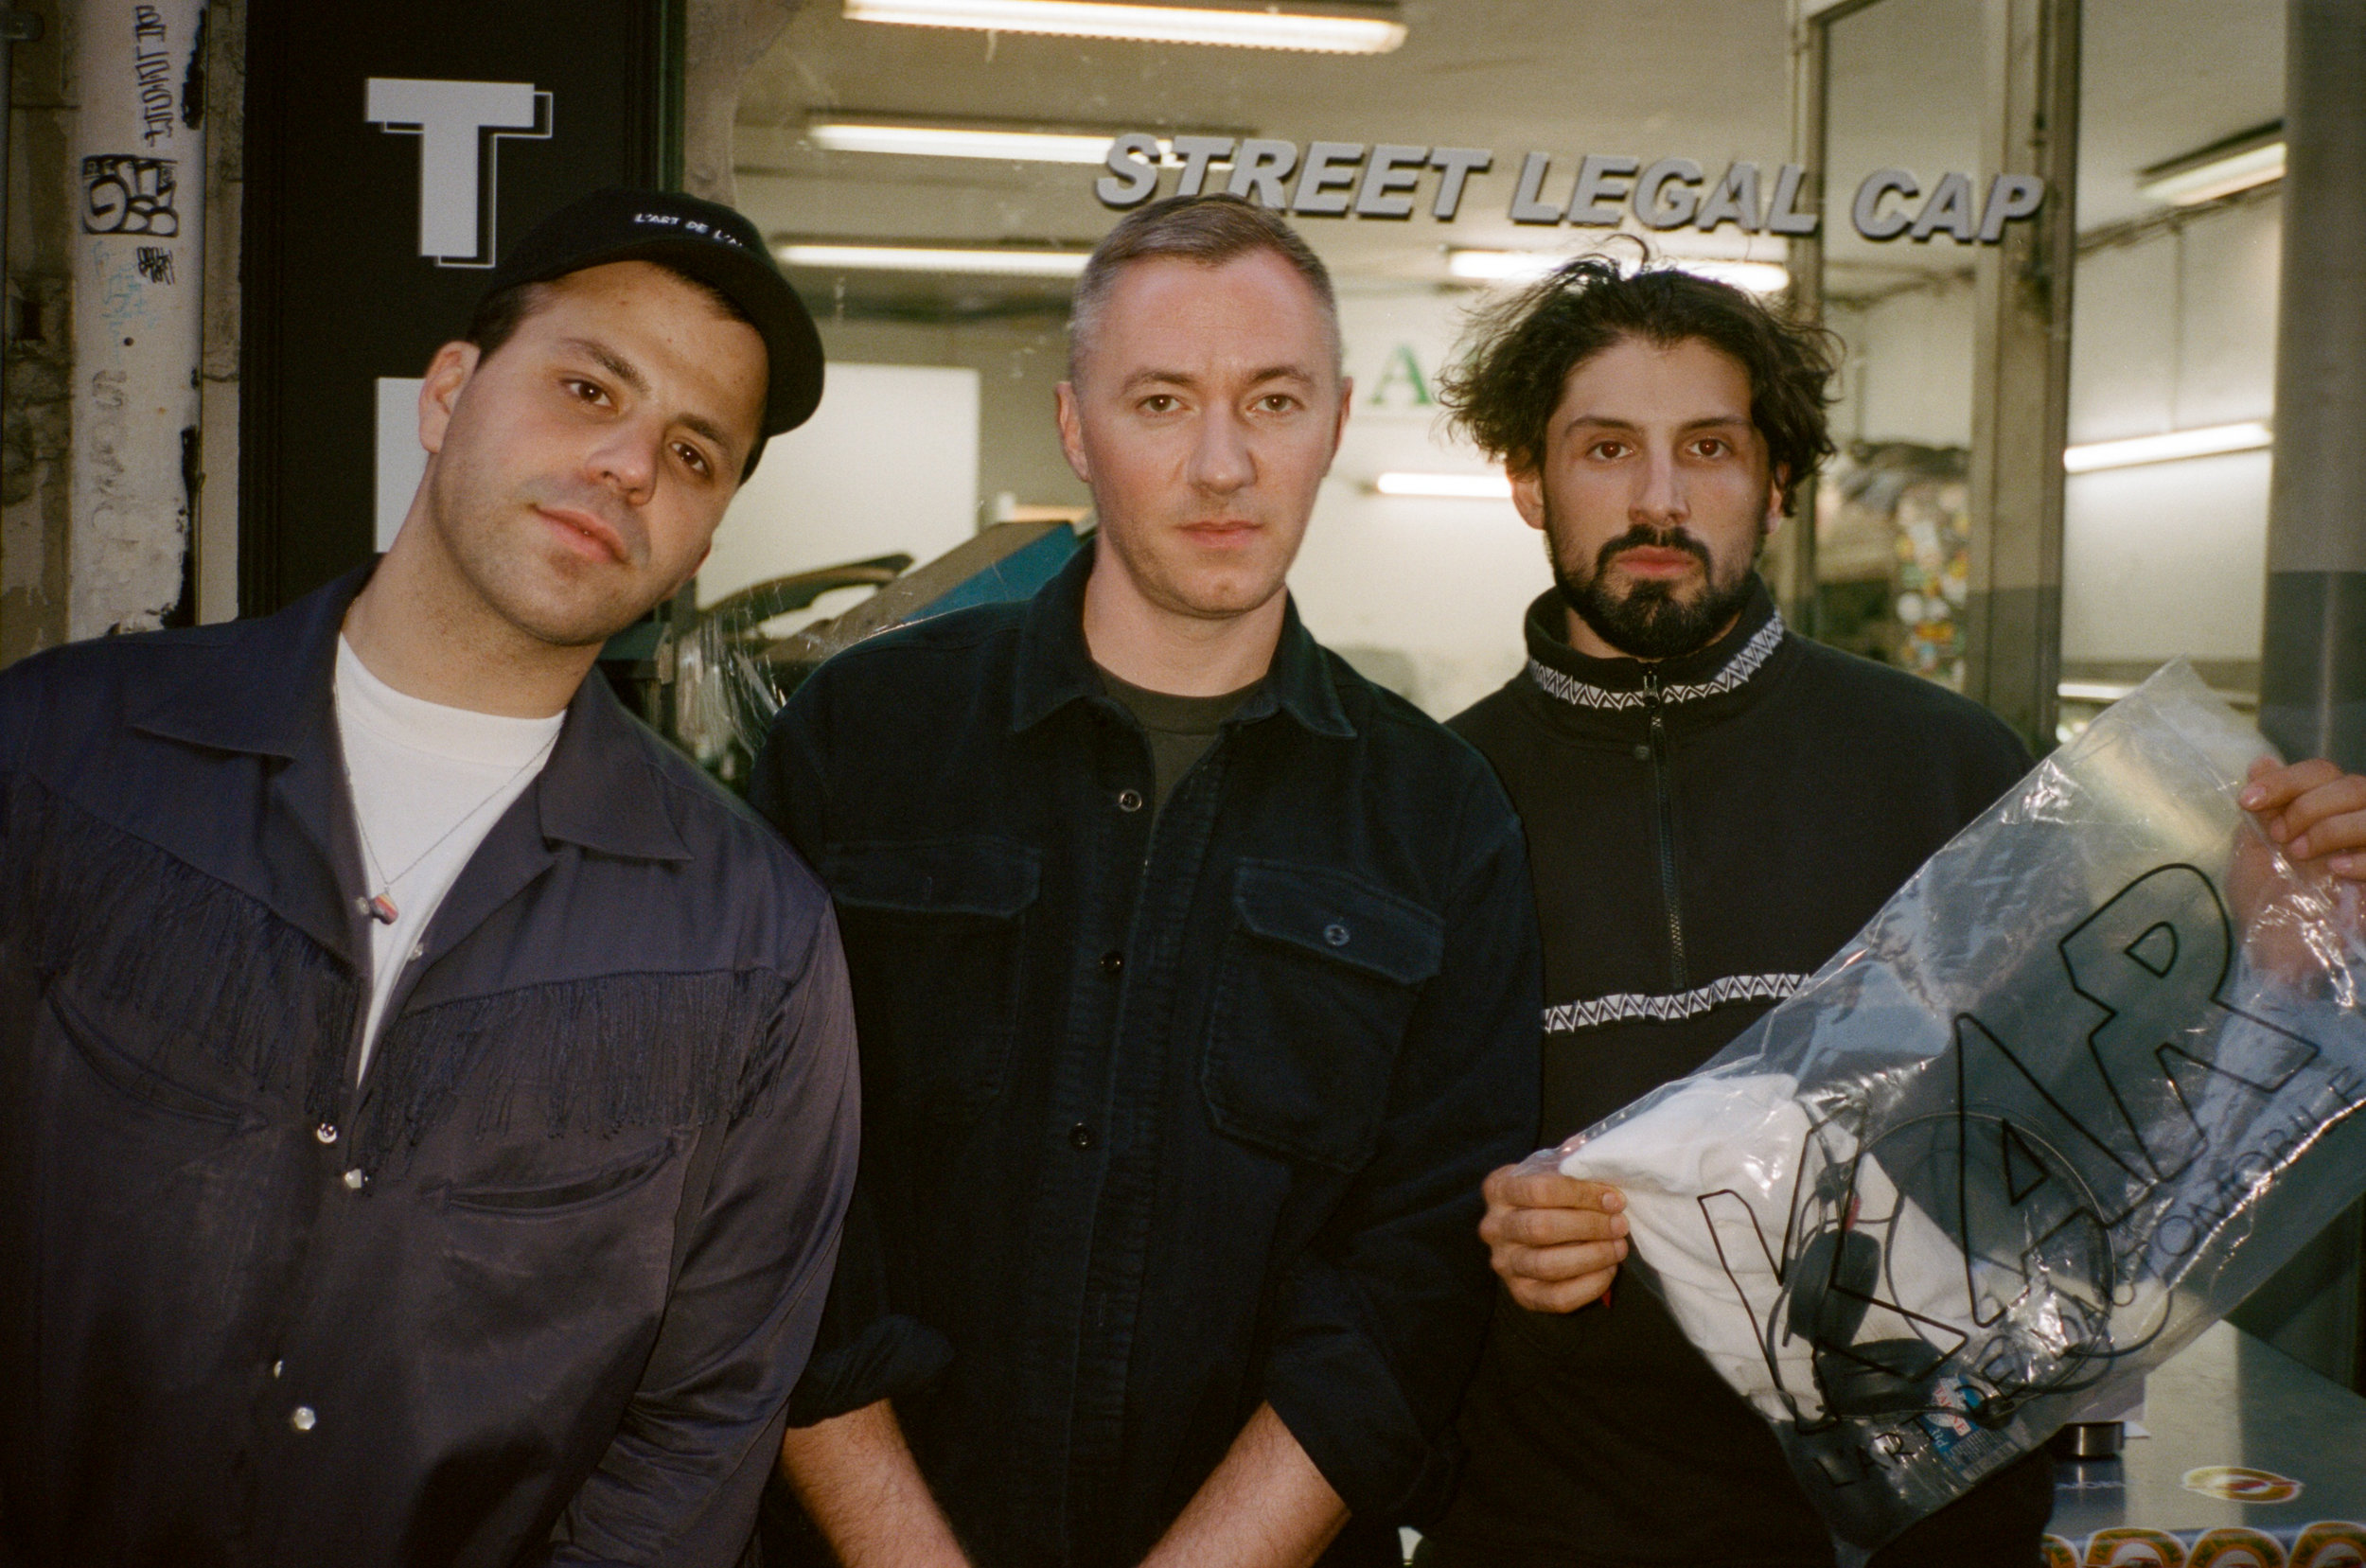 L'art de L'automobile DJ team: Sweetboydaniel Benji B Pedro Cavaliere